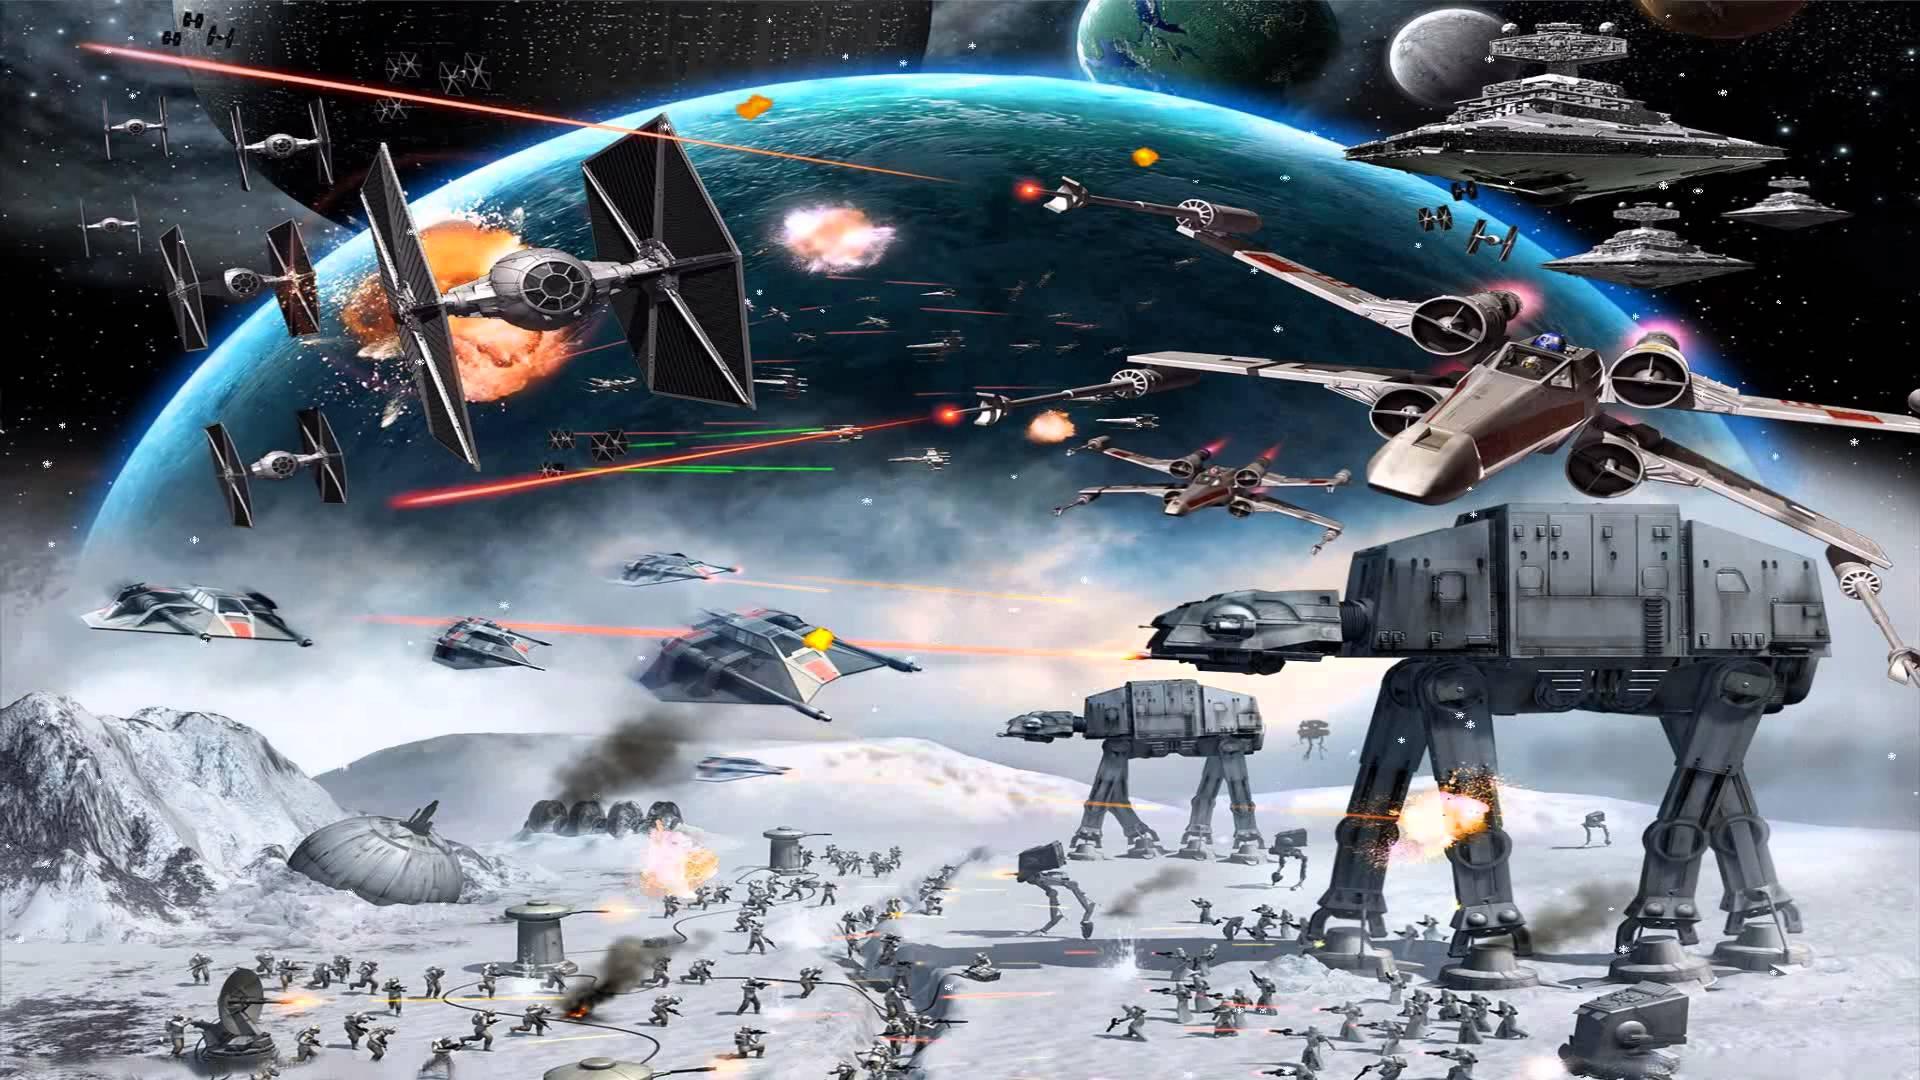 Star Wars Animated Screensaver httpwwwscreensavergiftcom 1920x1080